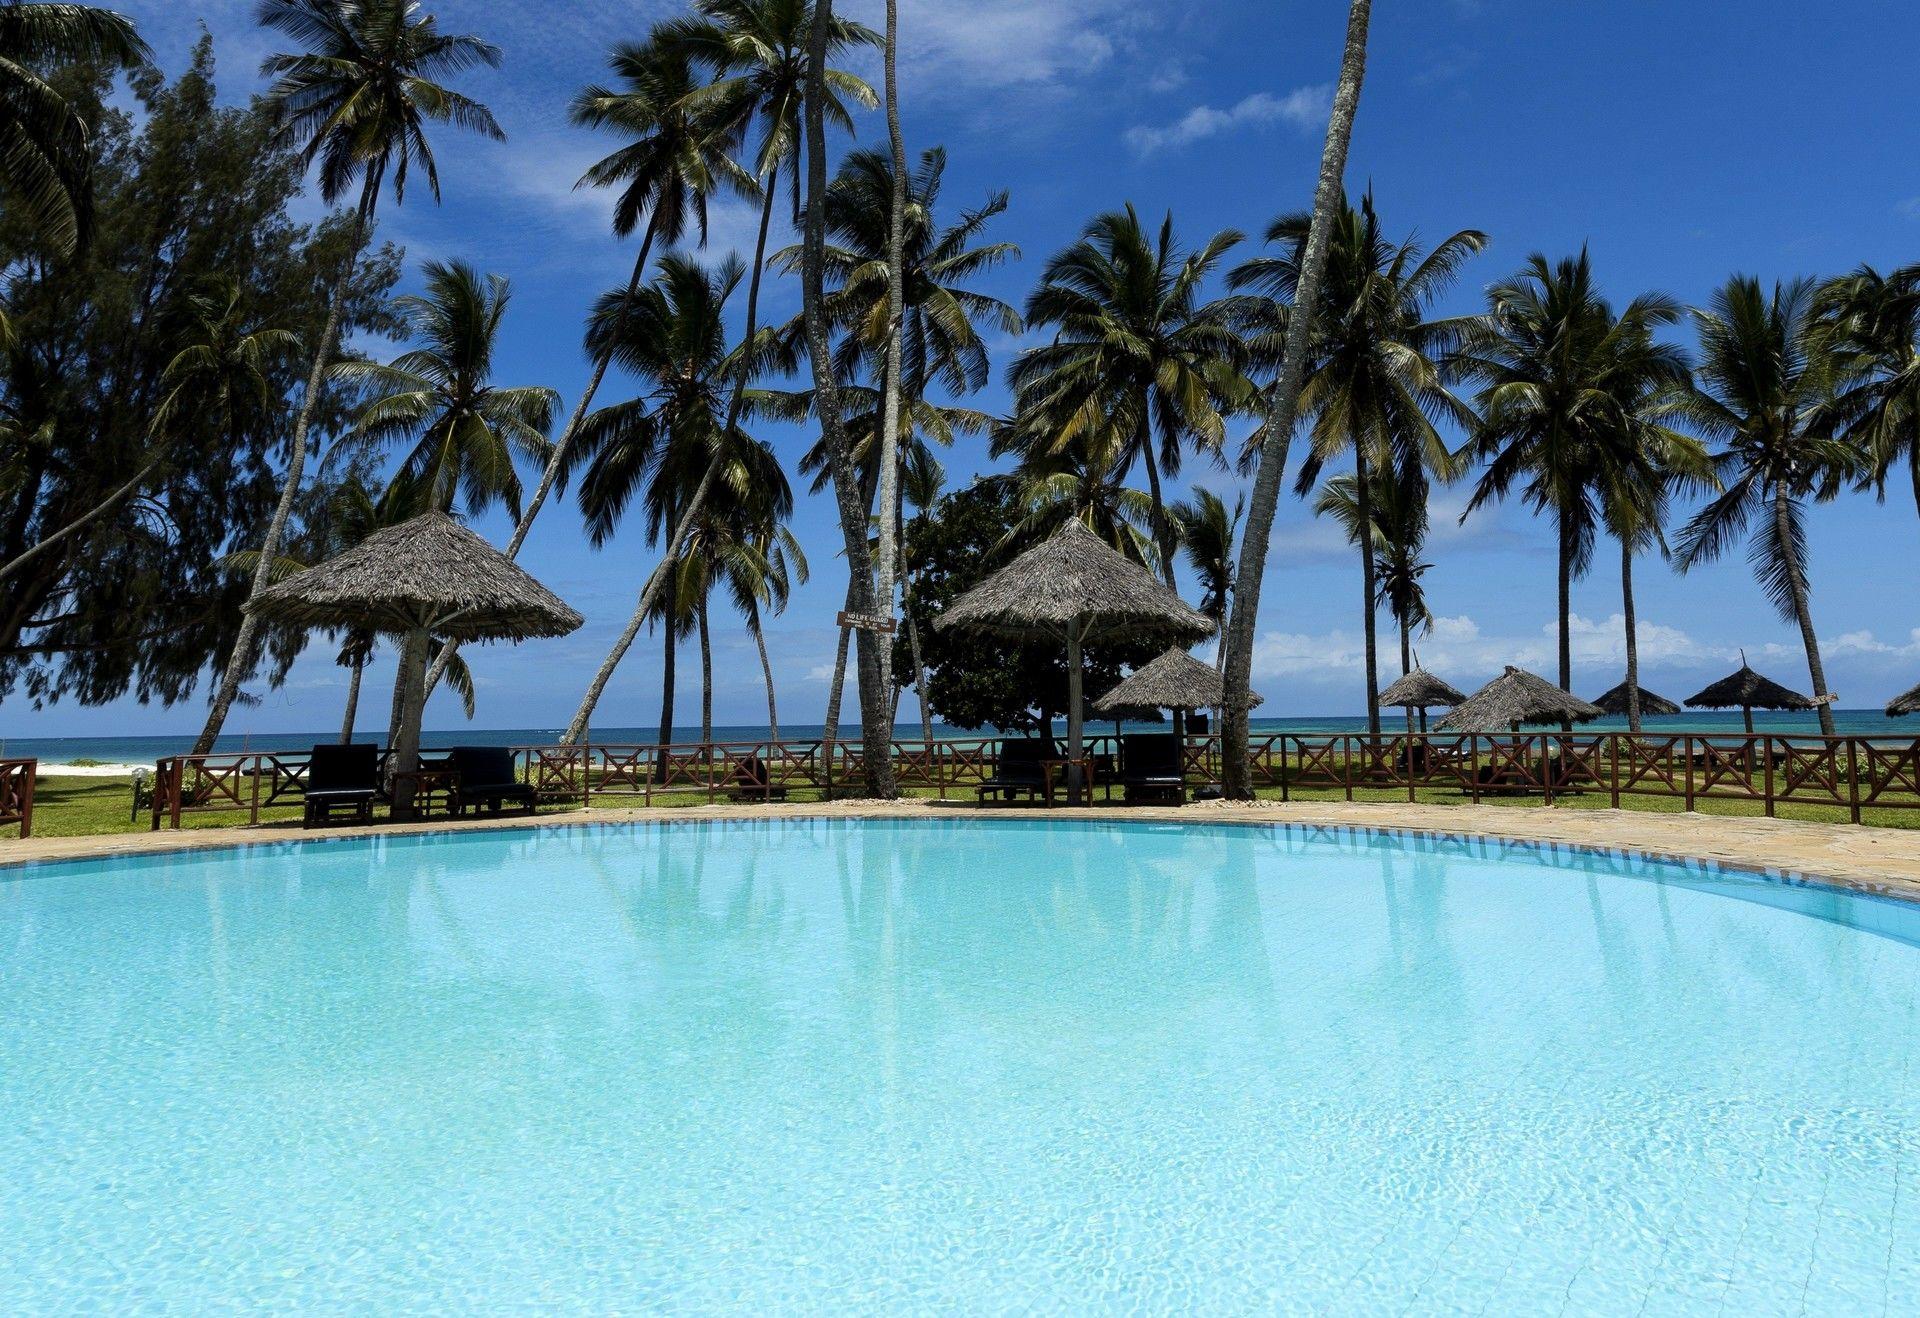 Hôtel neptune paradise beach resort et spa 4*